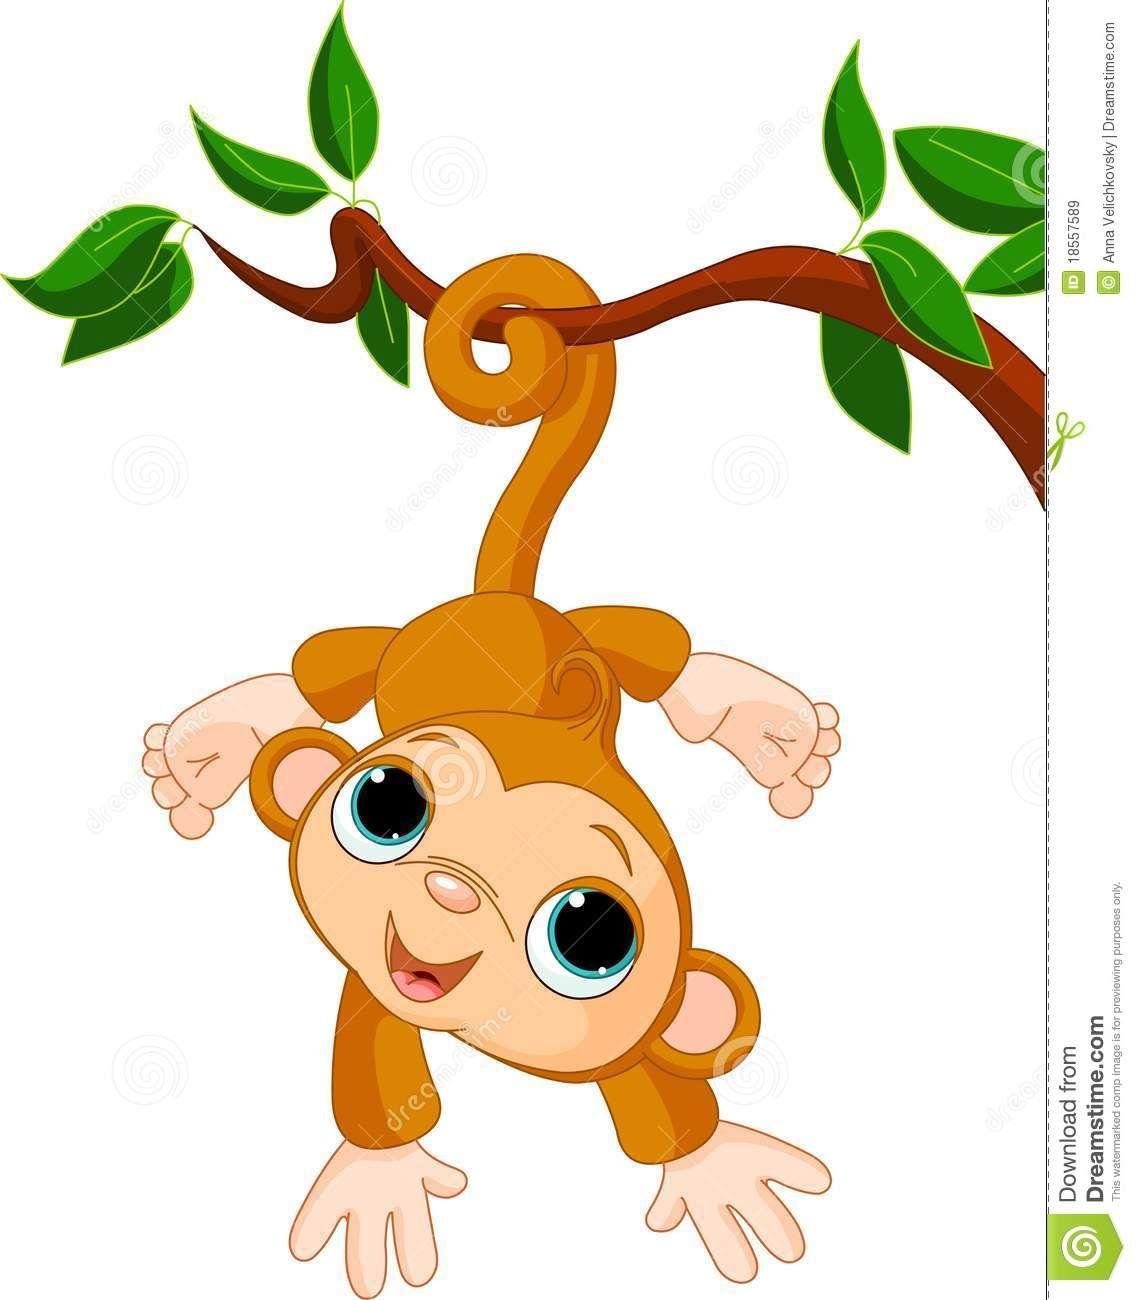 Cartoon monkey clipart pinterest. Girl clip art in